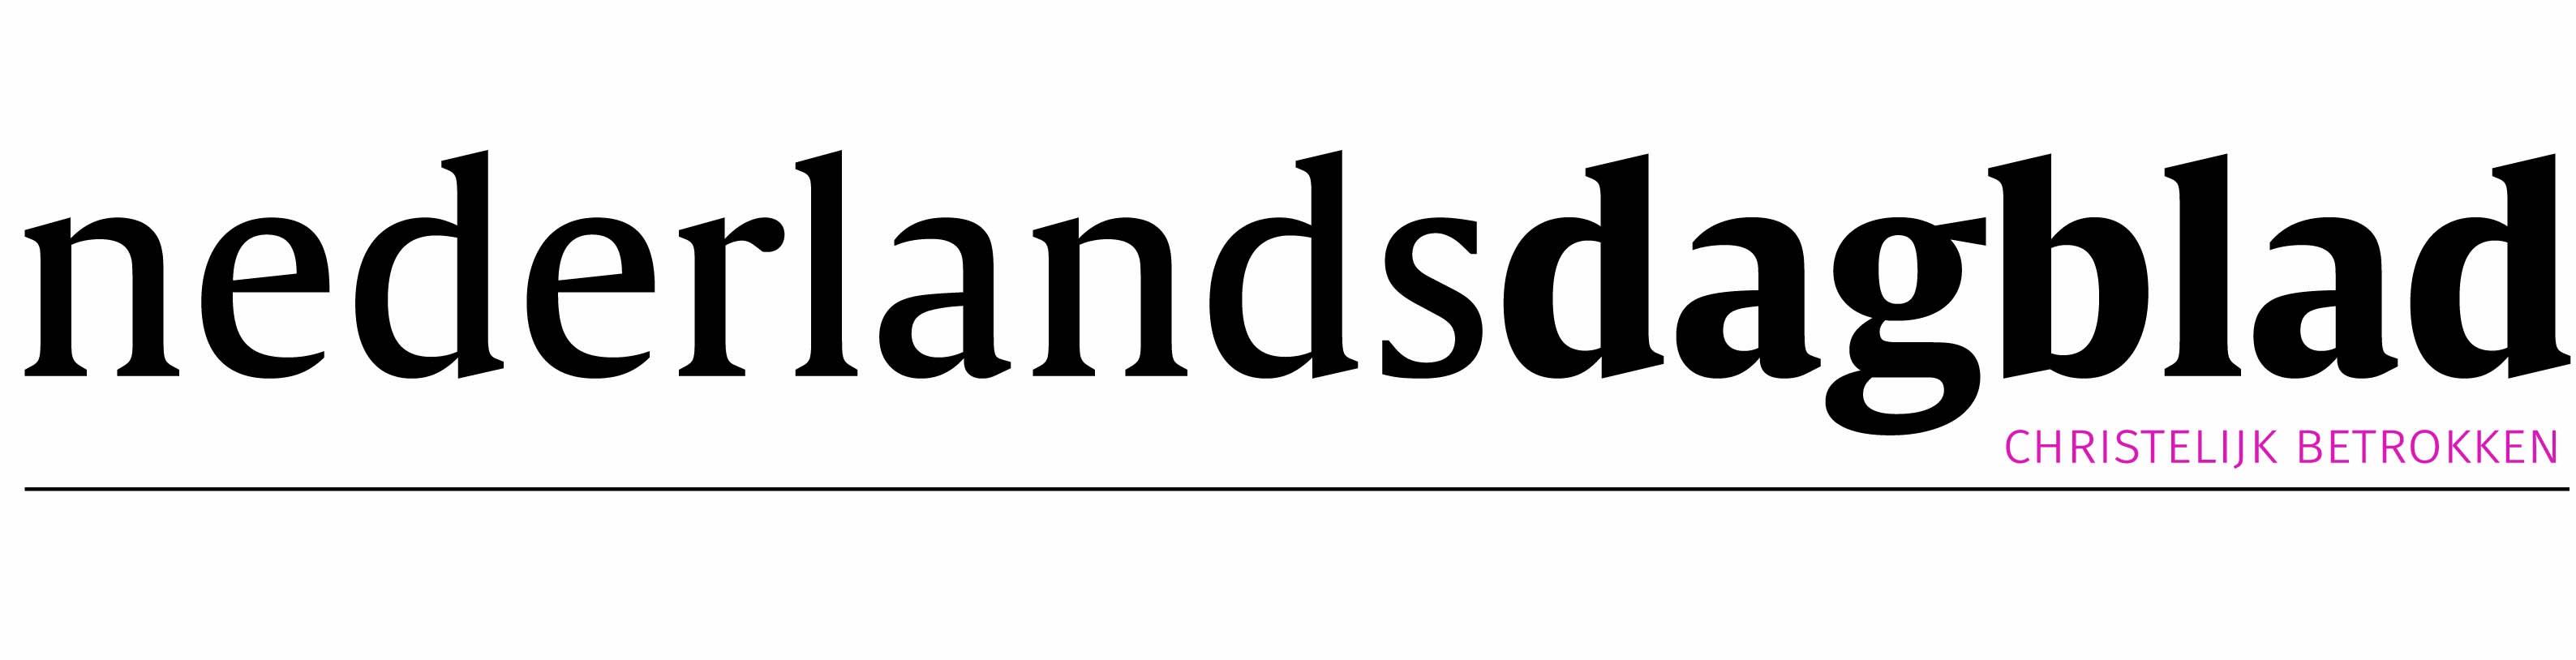 Het Nederlands Dagblad